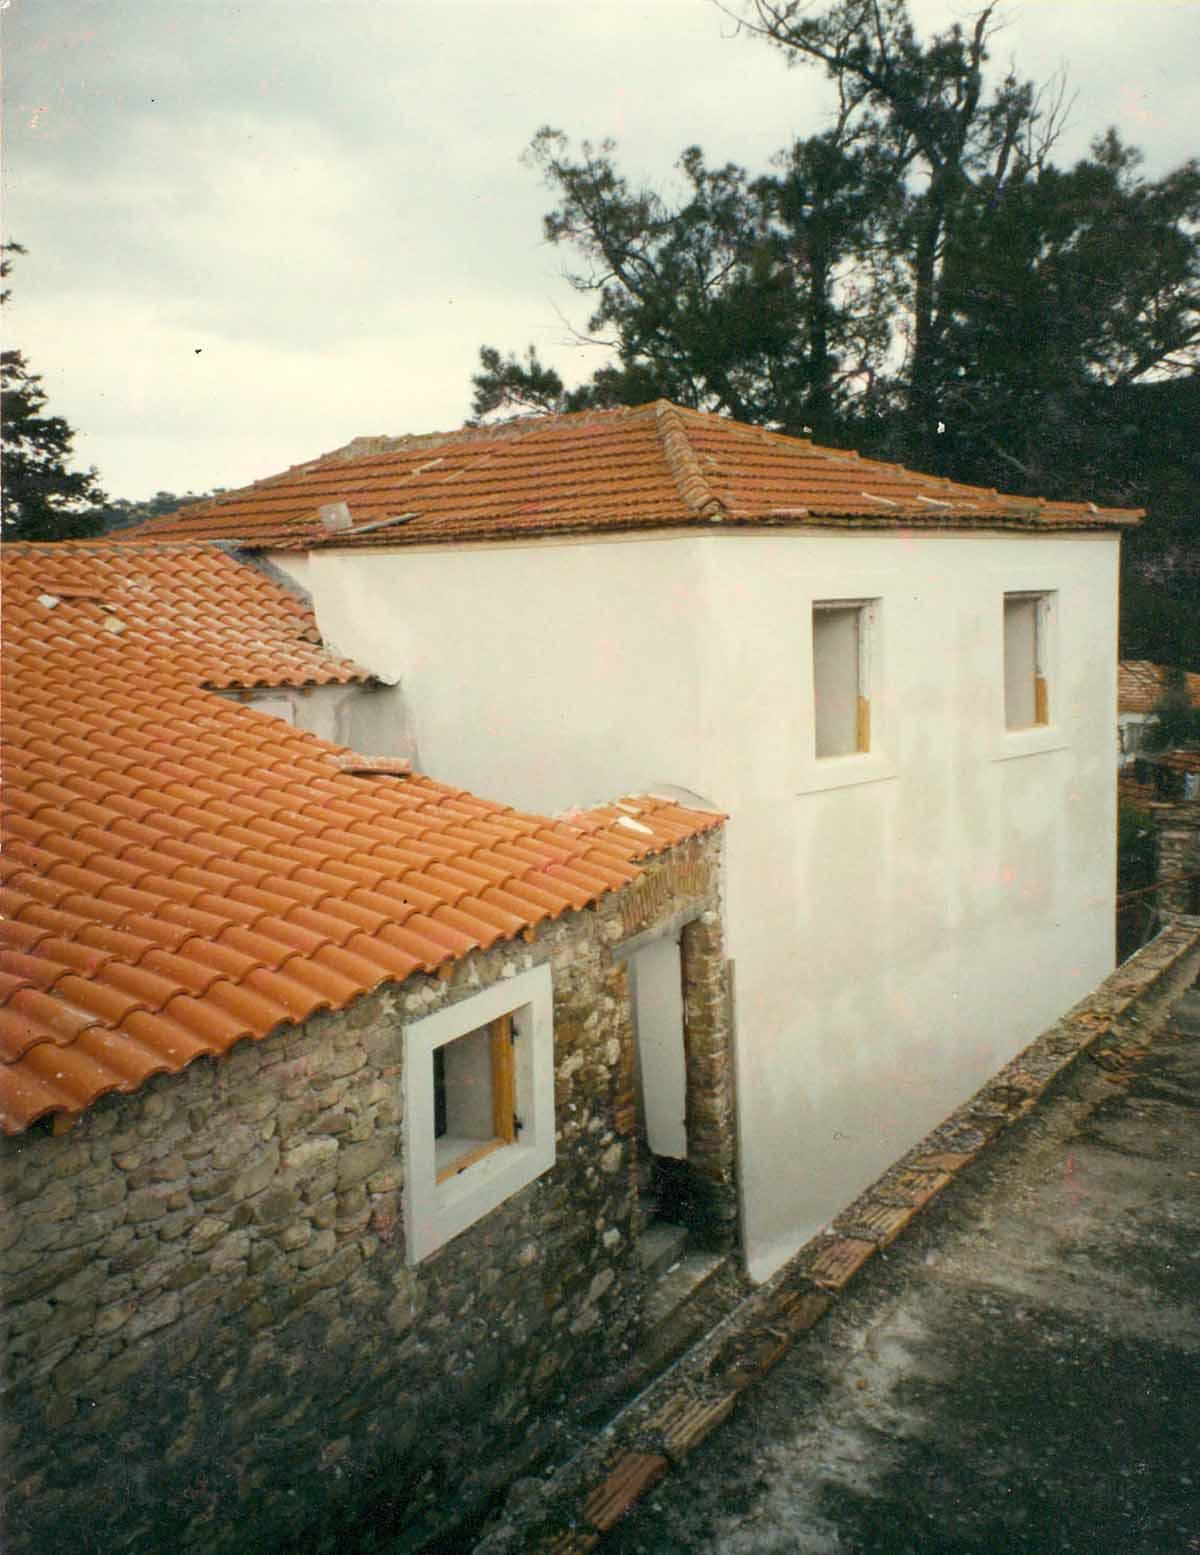 Restoration of a Listed Building in Pavlokastro Patras